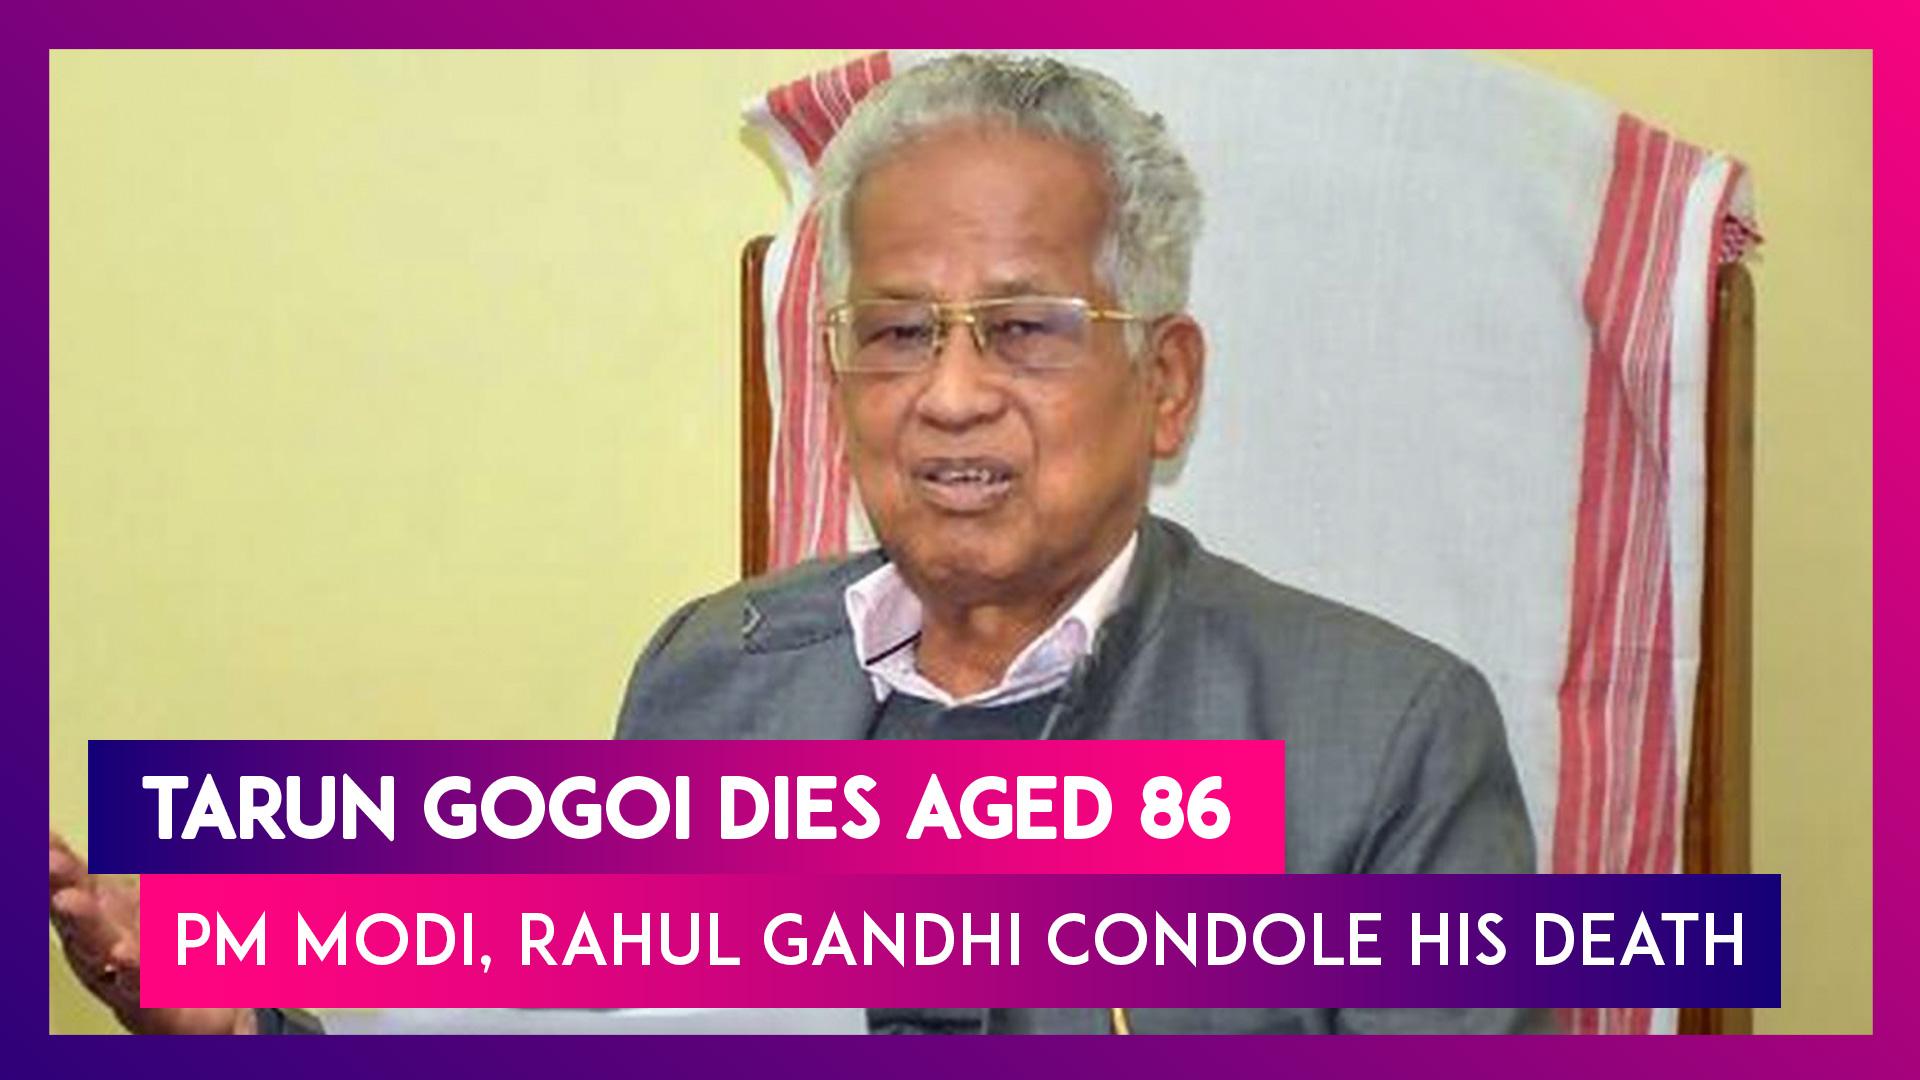 Tarun Gogoi, Former Assam CM Dies Aged 86; PM Modi, Rahul Gandhi Pay Tributes To Veteran Politician